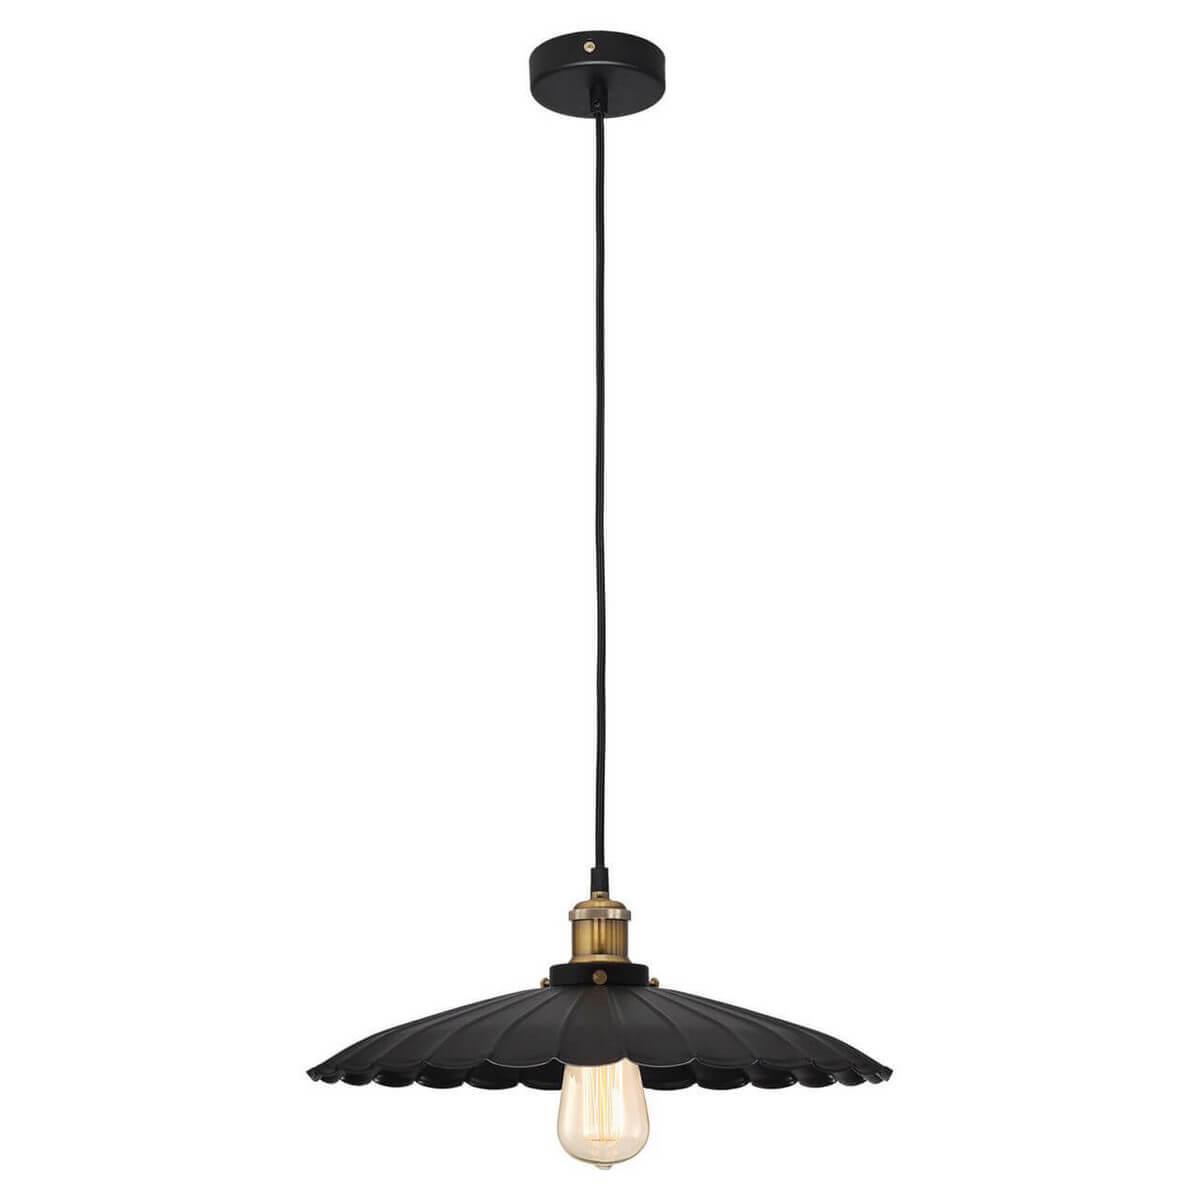 Подвесной светильник Lussole LOFT LSP-9603, E27, 60 Вт цена